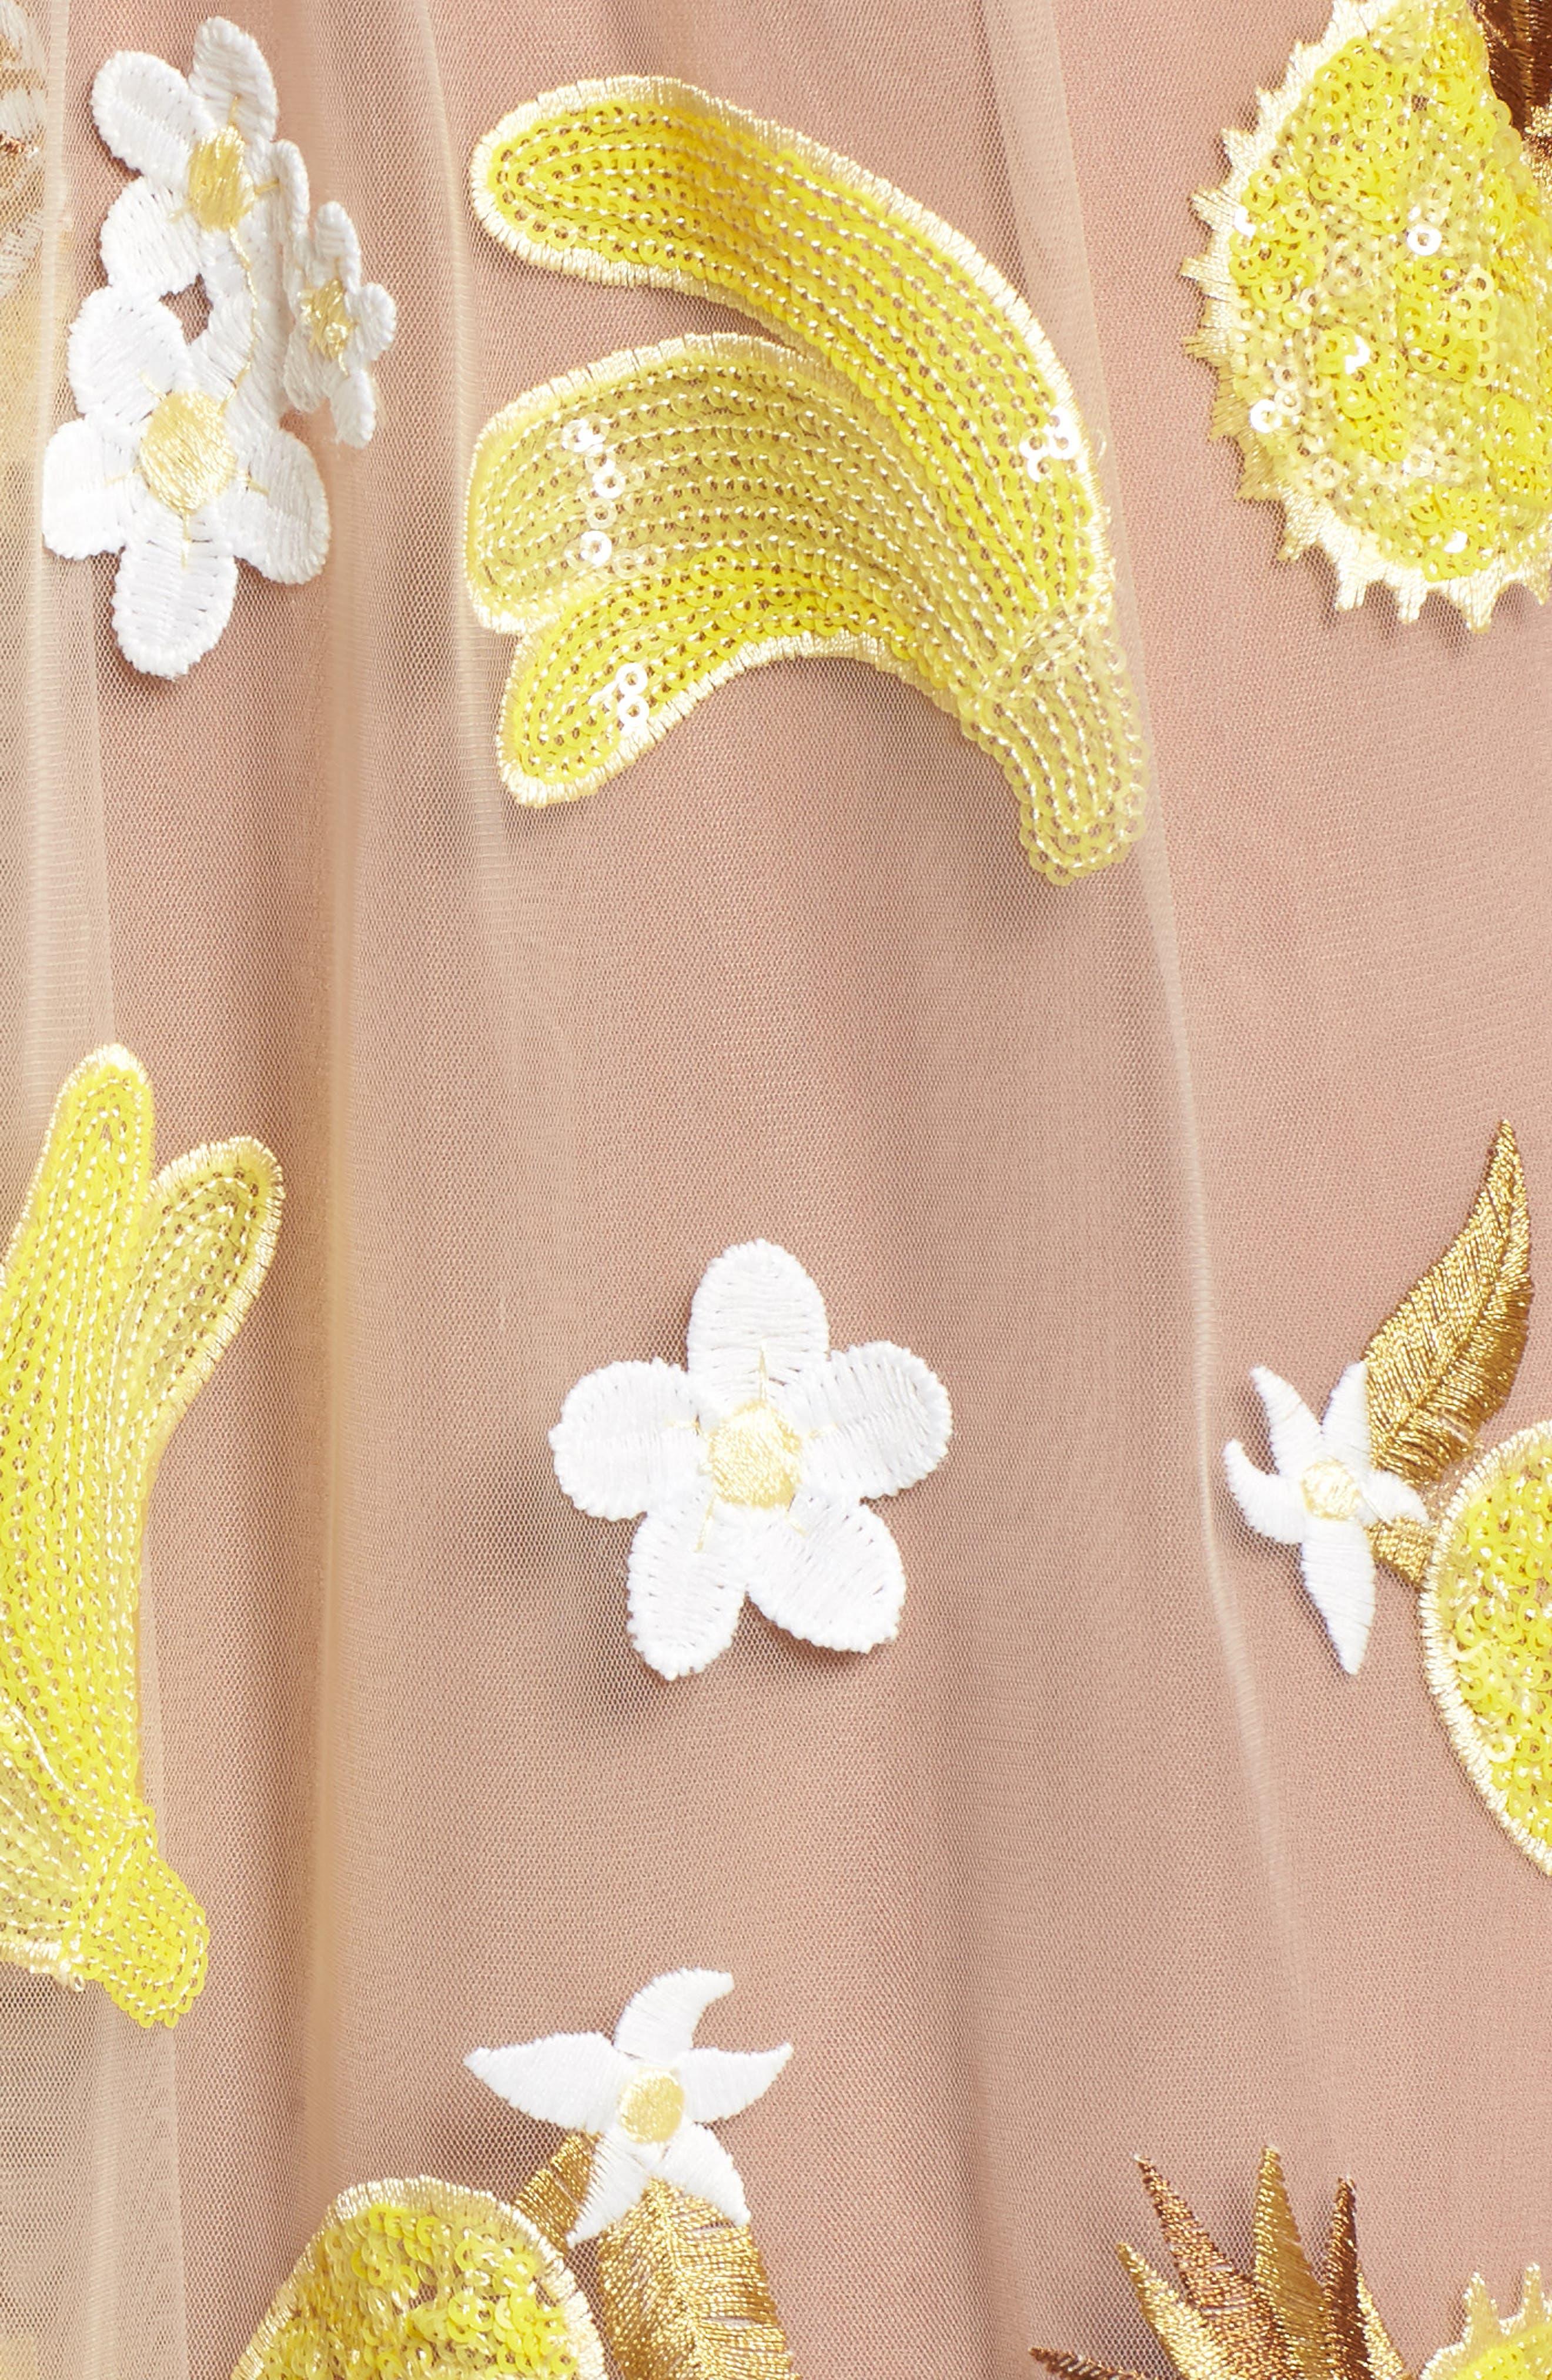 Fruitpunch Sequin Minidress,                             Alternate thumbnail 5, color,                             250